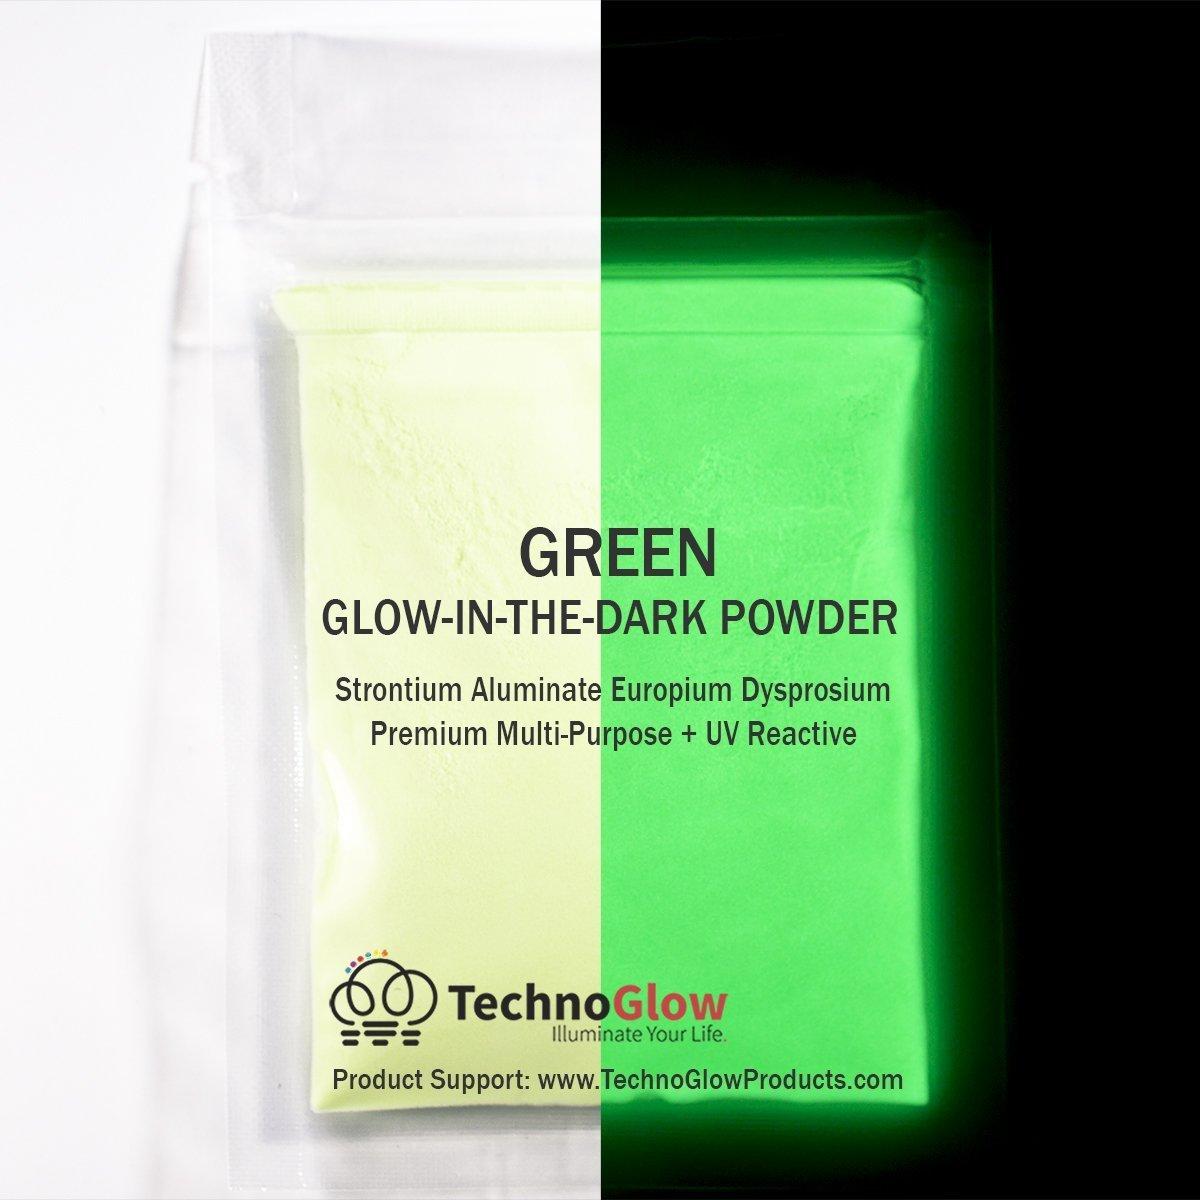 Green Glow in the Dark & UV Powder - Waterproof 45-60 Microns (8 OZ)